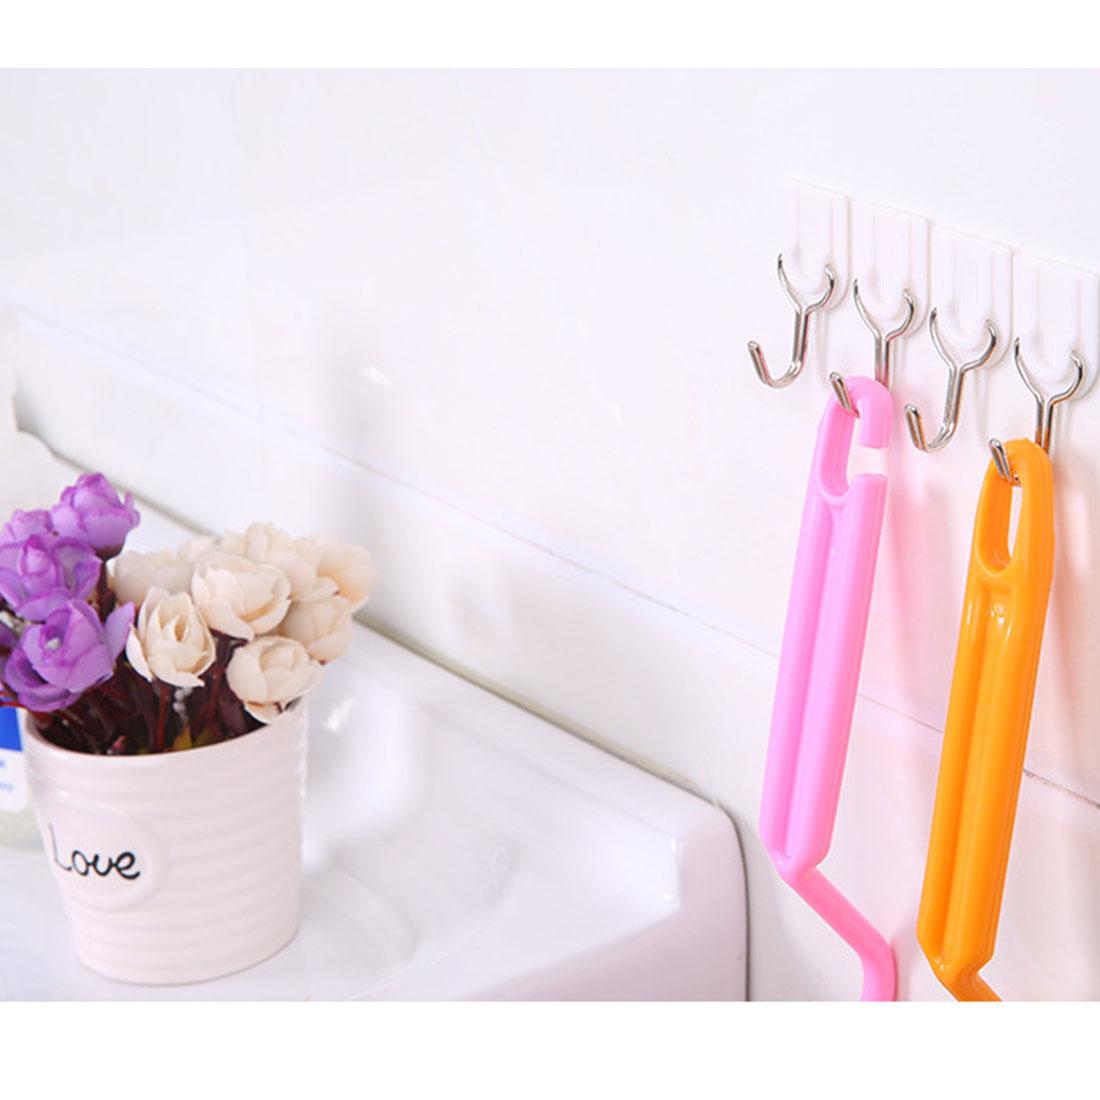 6 PCS White Bathroom Door Hooks Family Wall Hanger Hats Bag Key Adhesive Plastic Hook Coat Wall Hooks(China (Mainland))